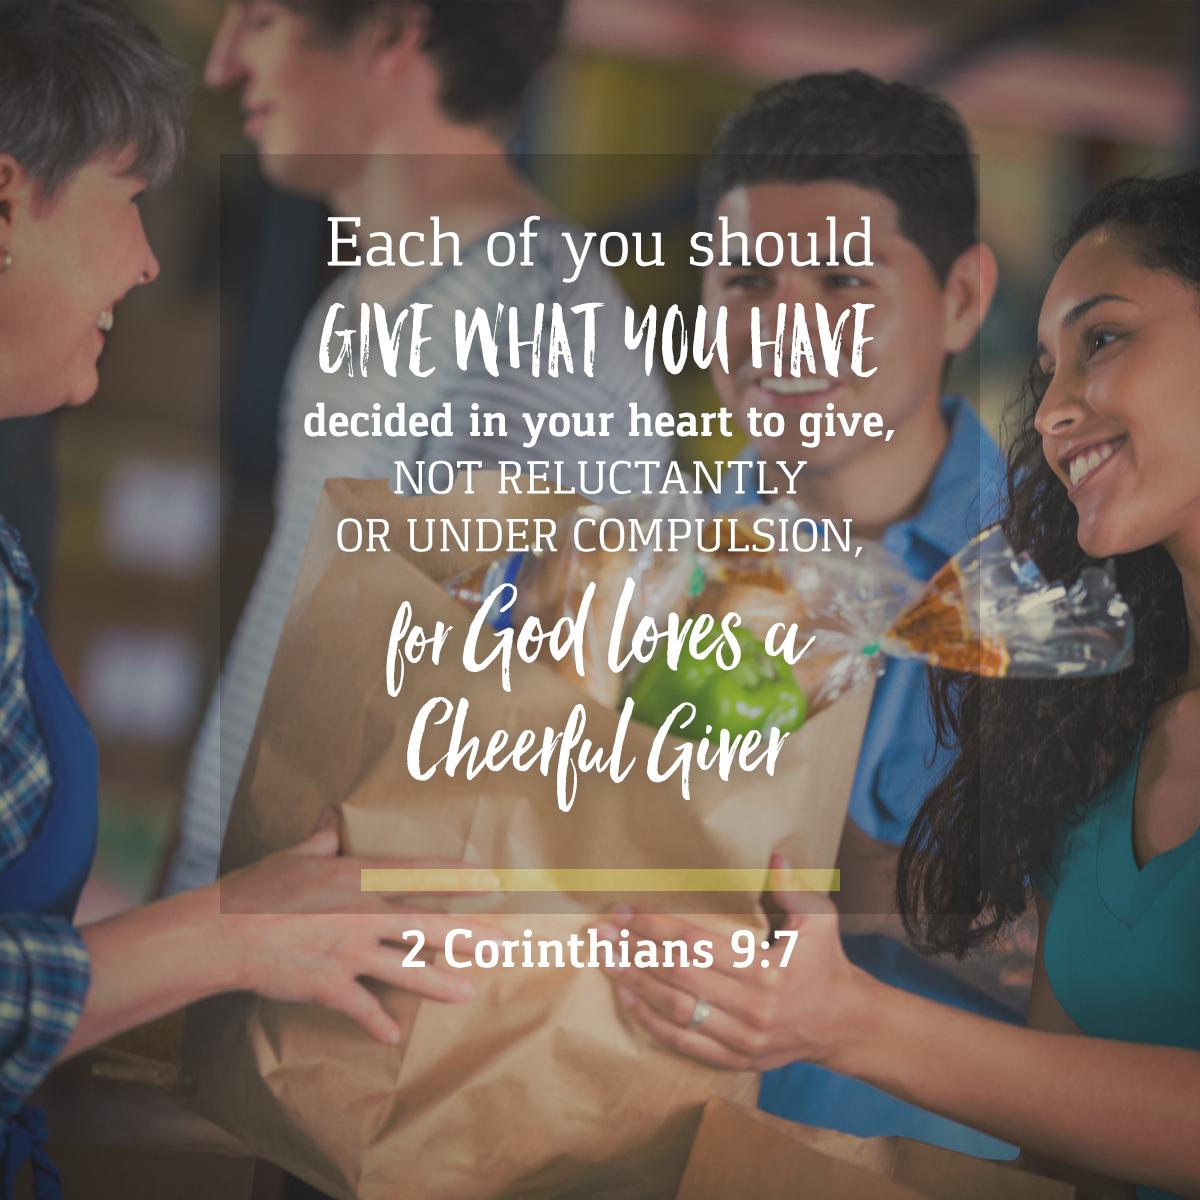 2 Corinthians 9:7